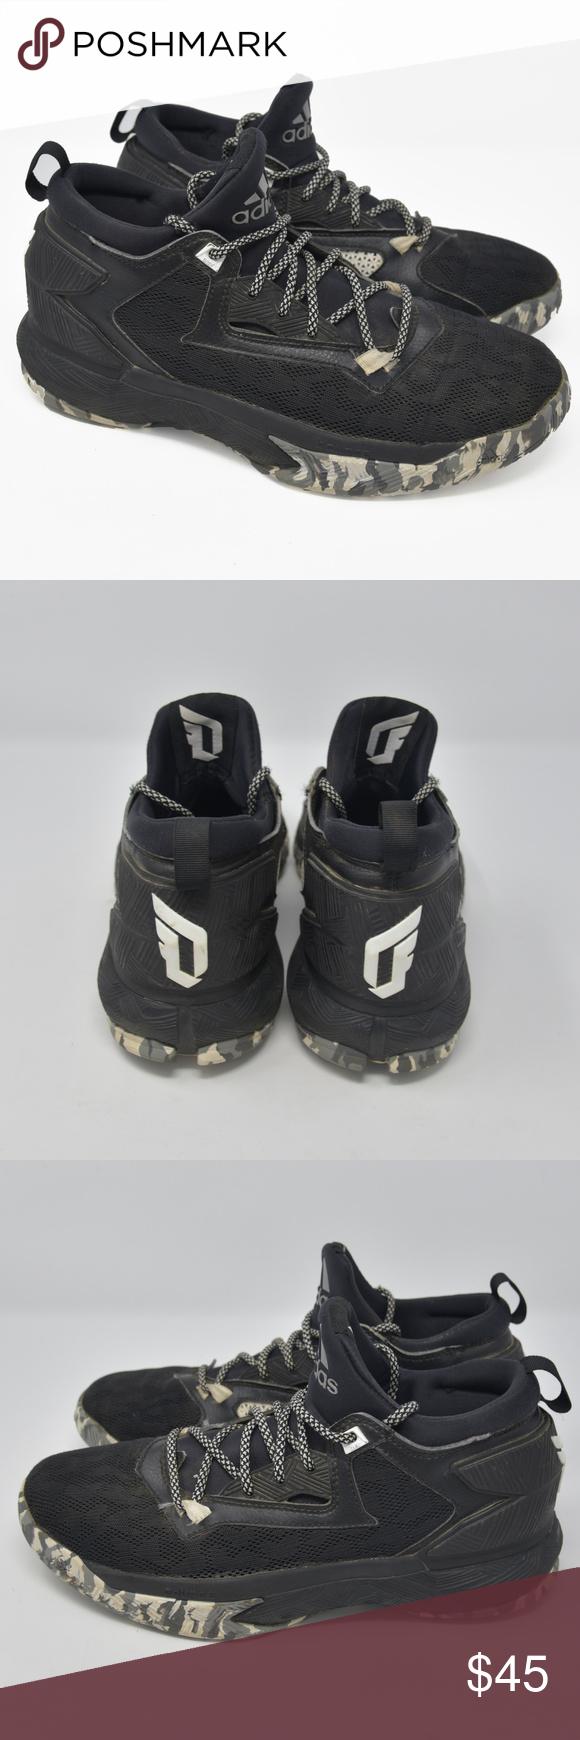 fc62d3f152652 Adidas D Lillard 2 Bounce Sz 8.5 Basketball Shoes Adidas D Lillard 2 Bounce  Men s Sz